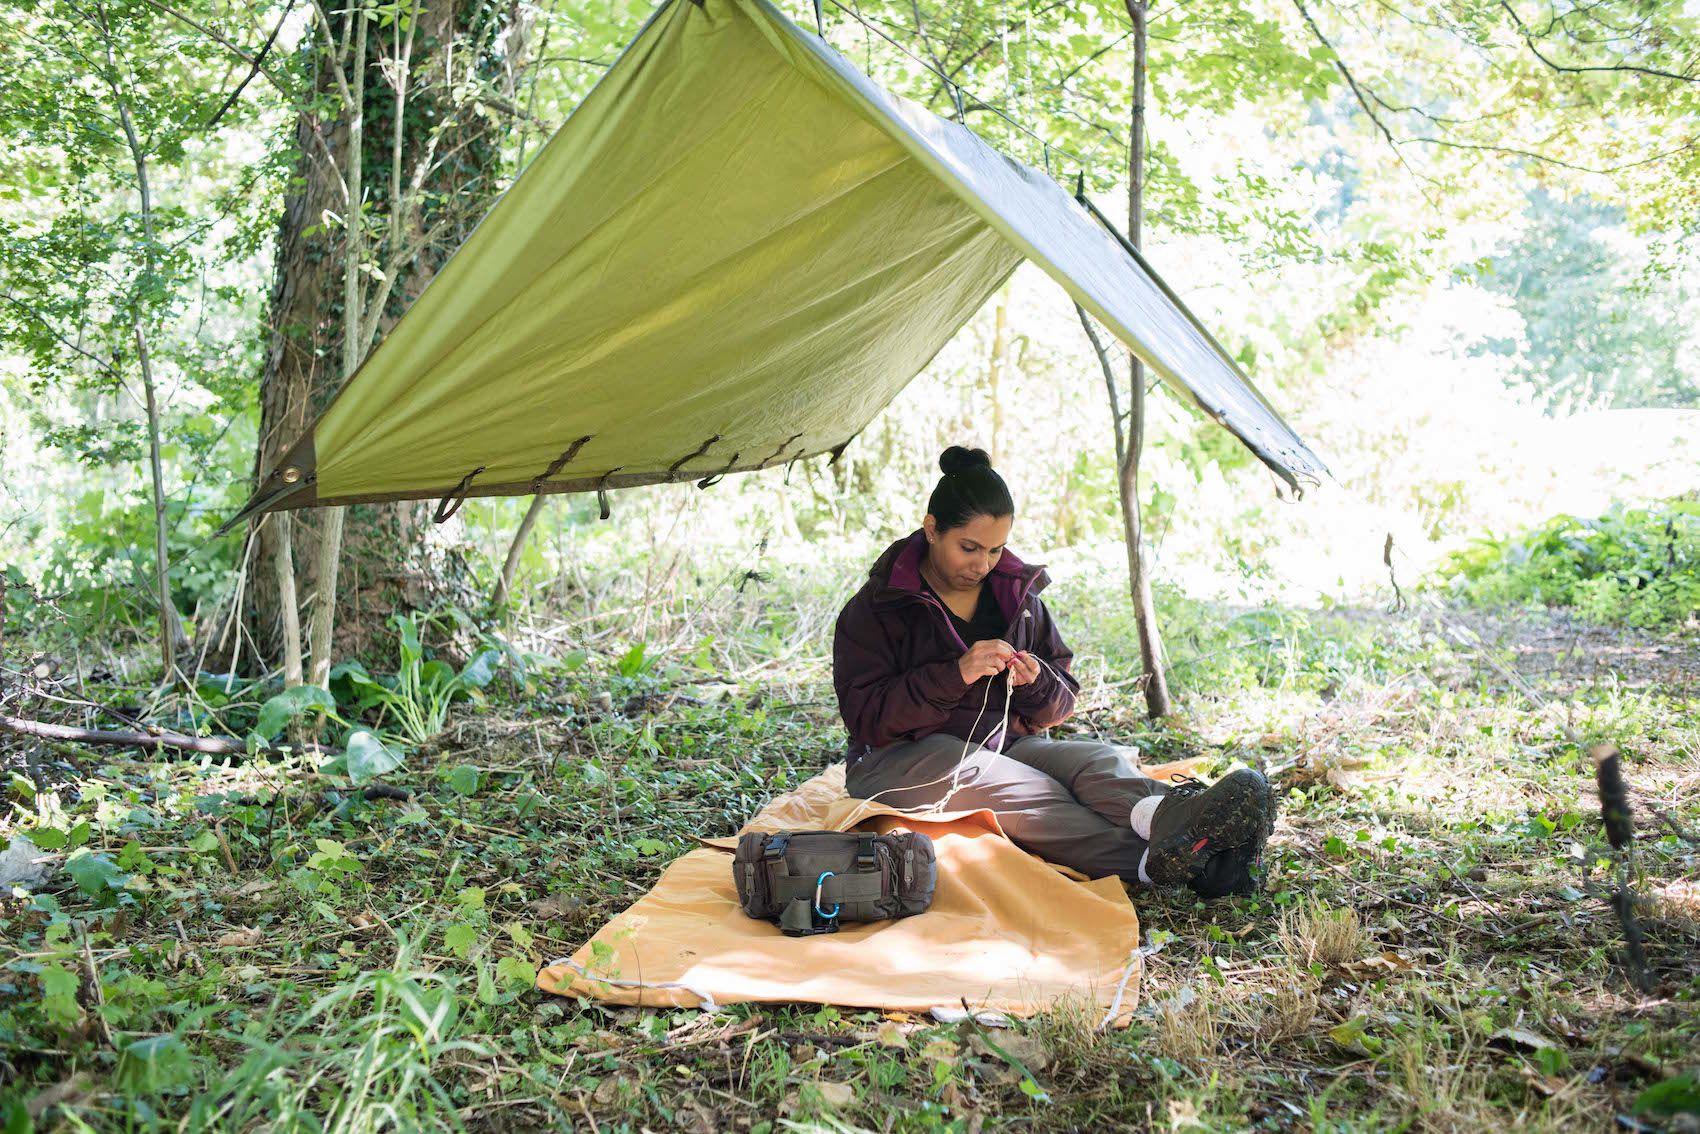 Campsites in Broxbourne – Cool Camping